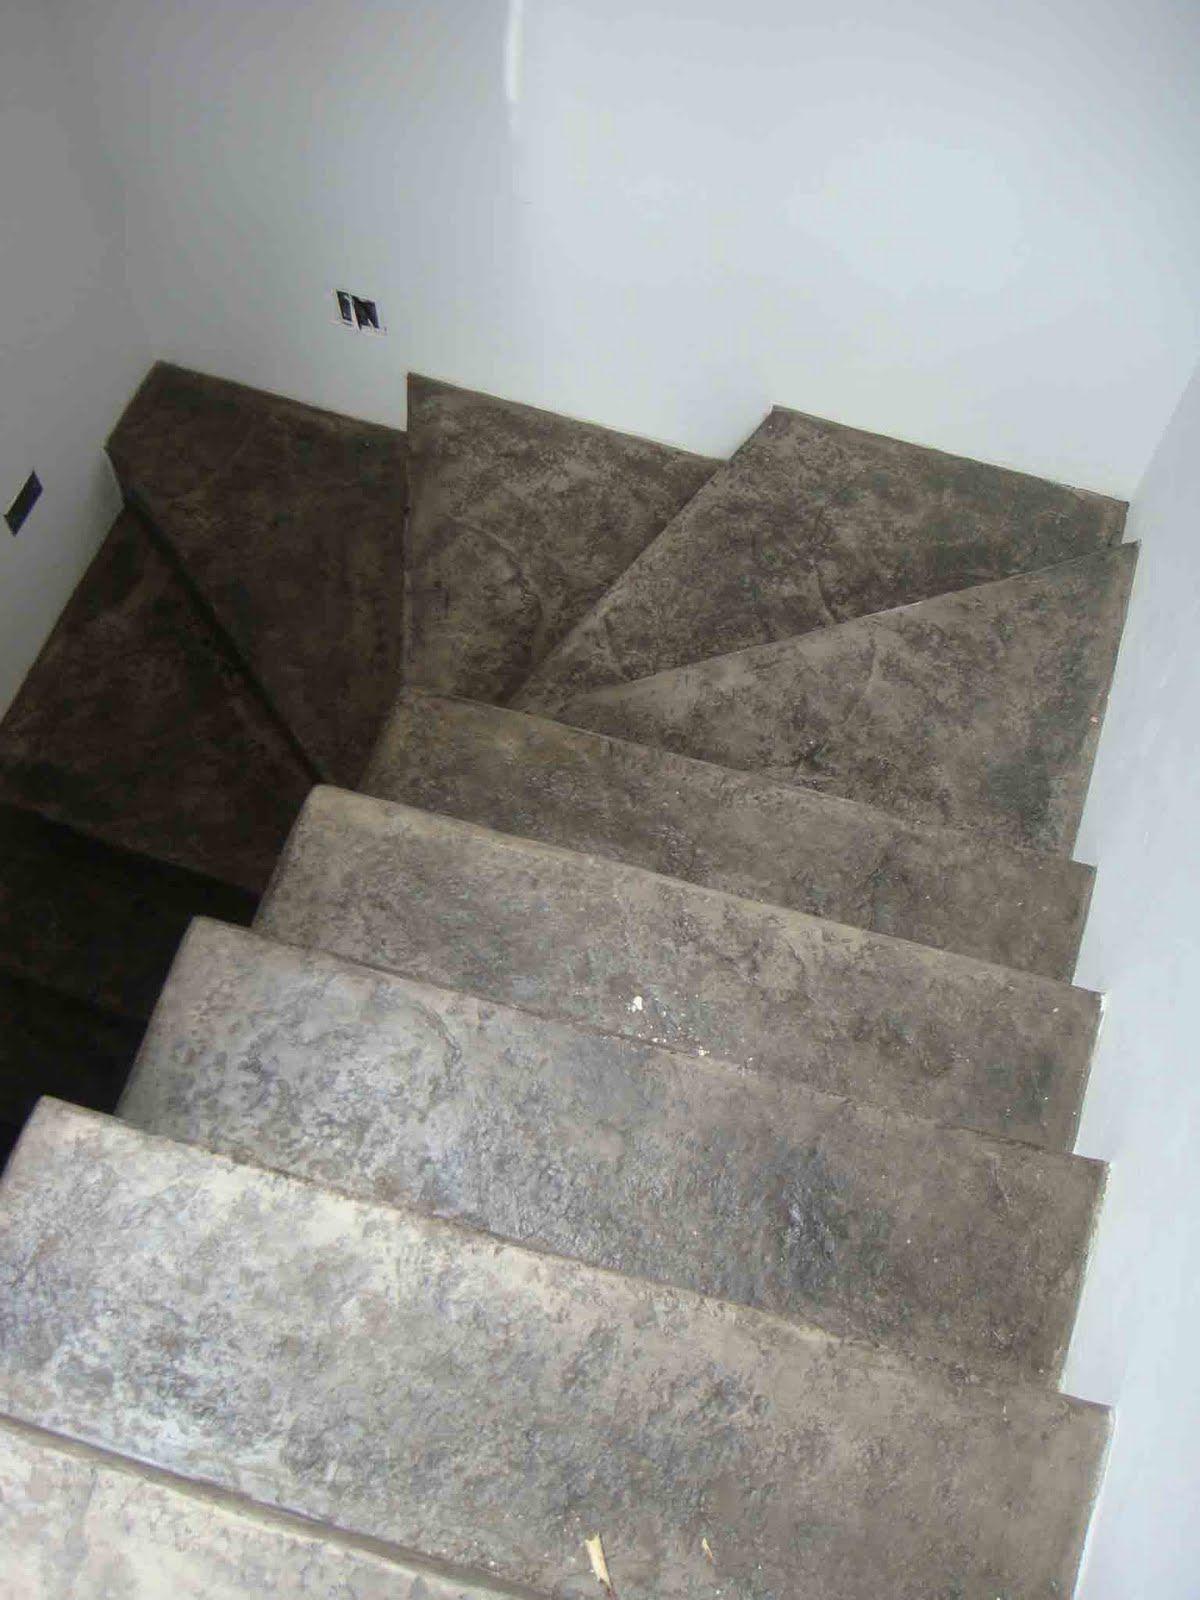 Cemento pulido 2 pisos pinterest cemento cemento - Pared cemento pulido ...